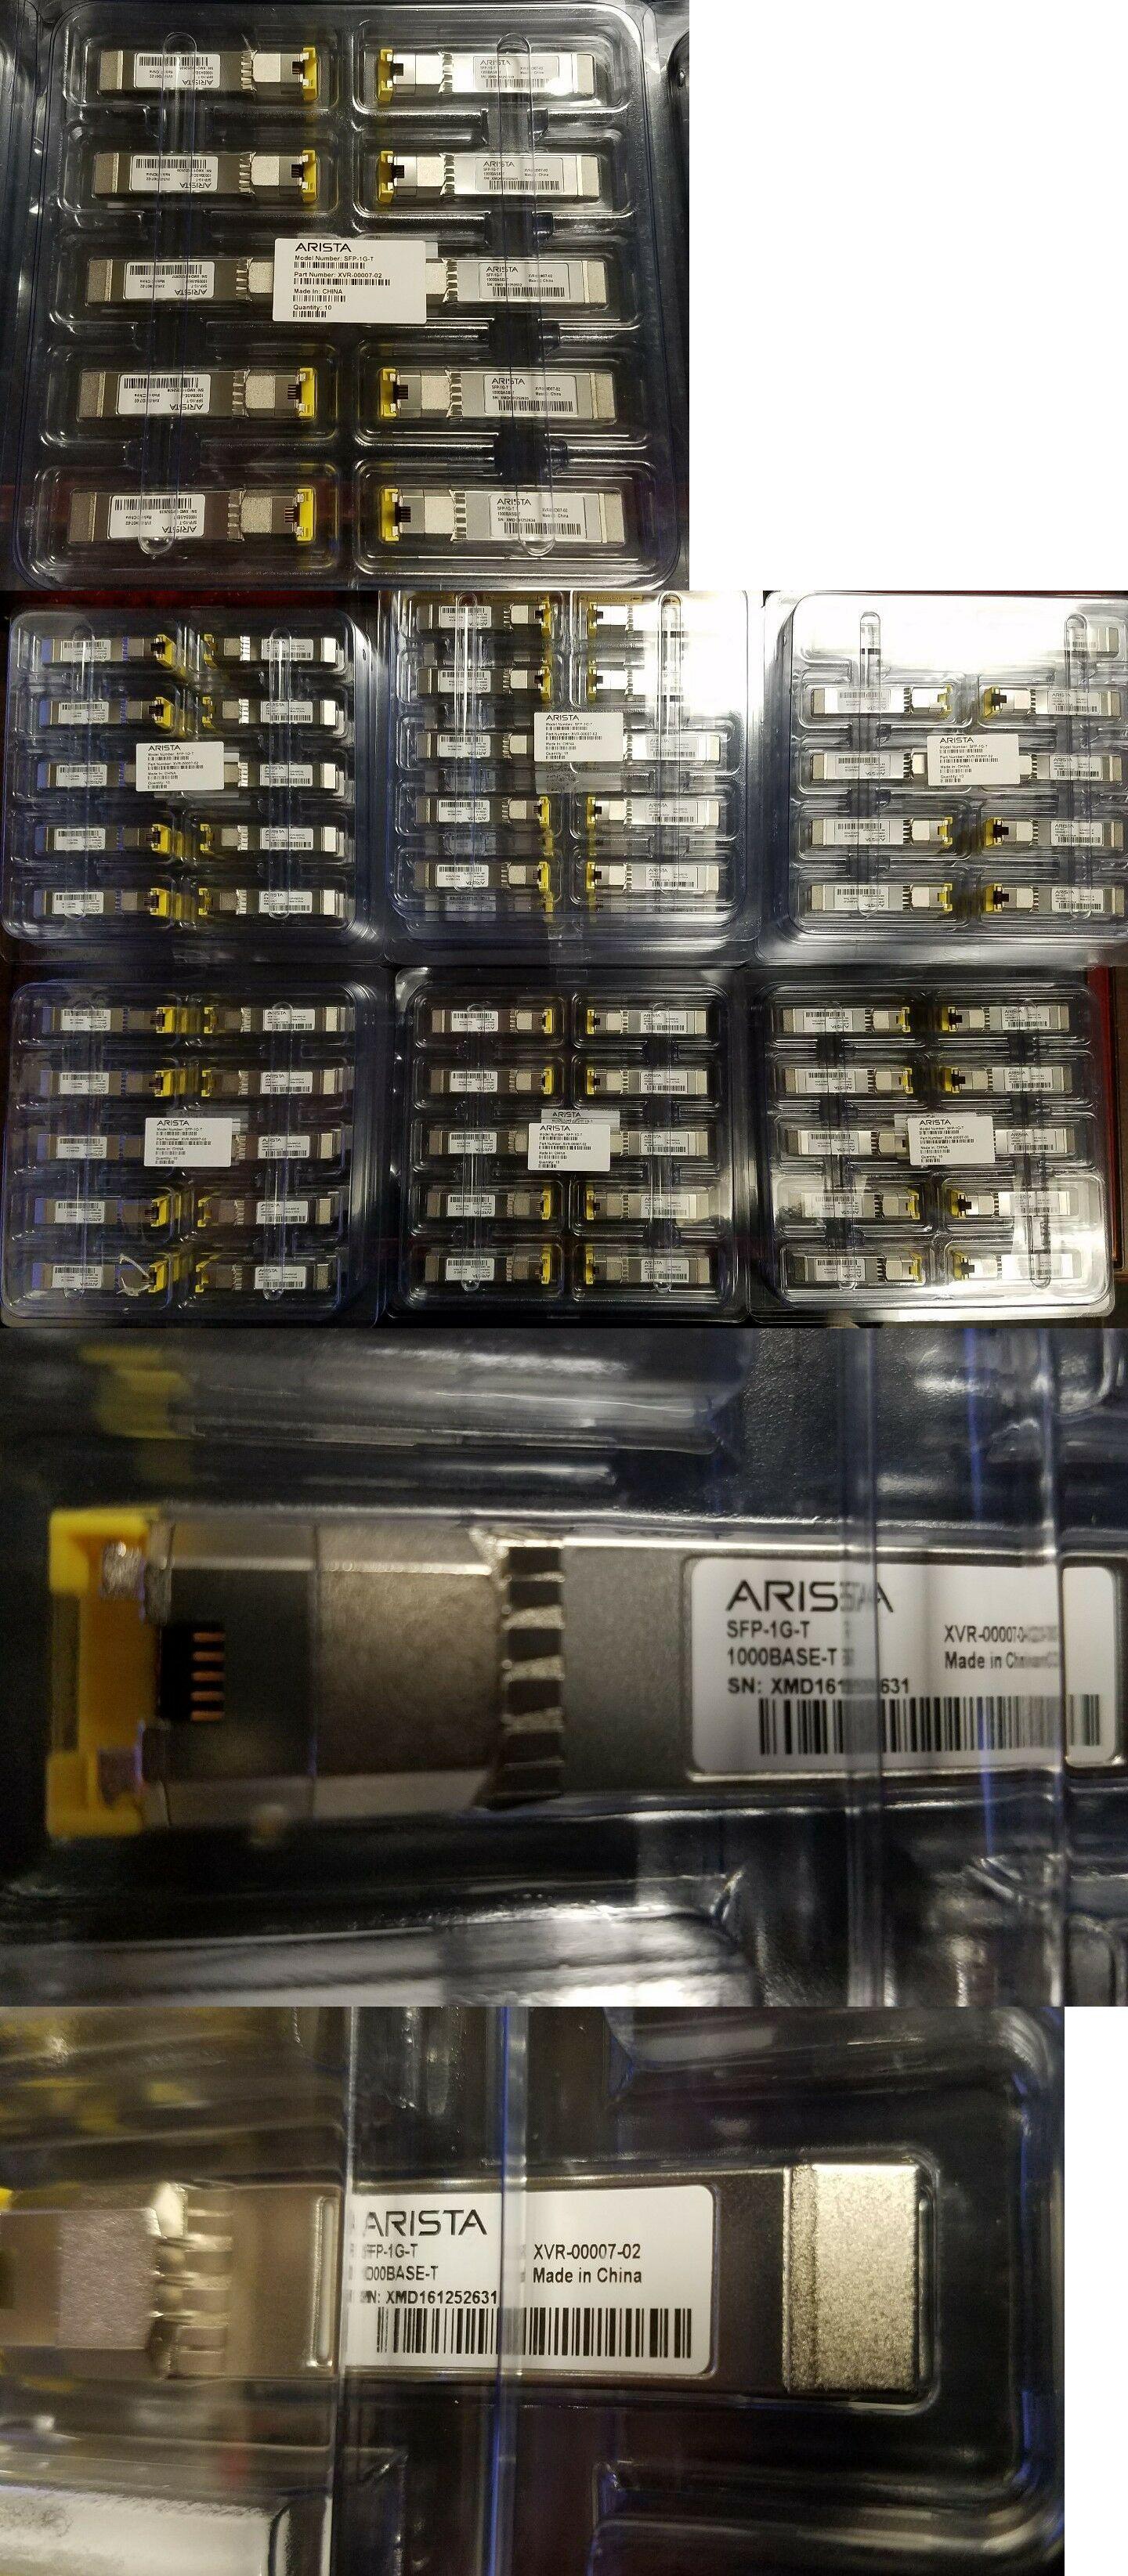 Brand New Lot of 10 Arista SFP-1G-T XVR-00007-02 Modules